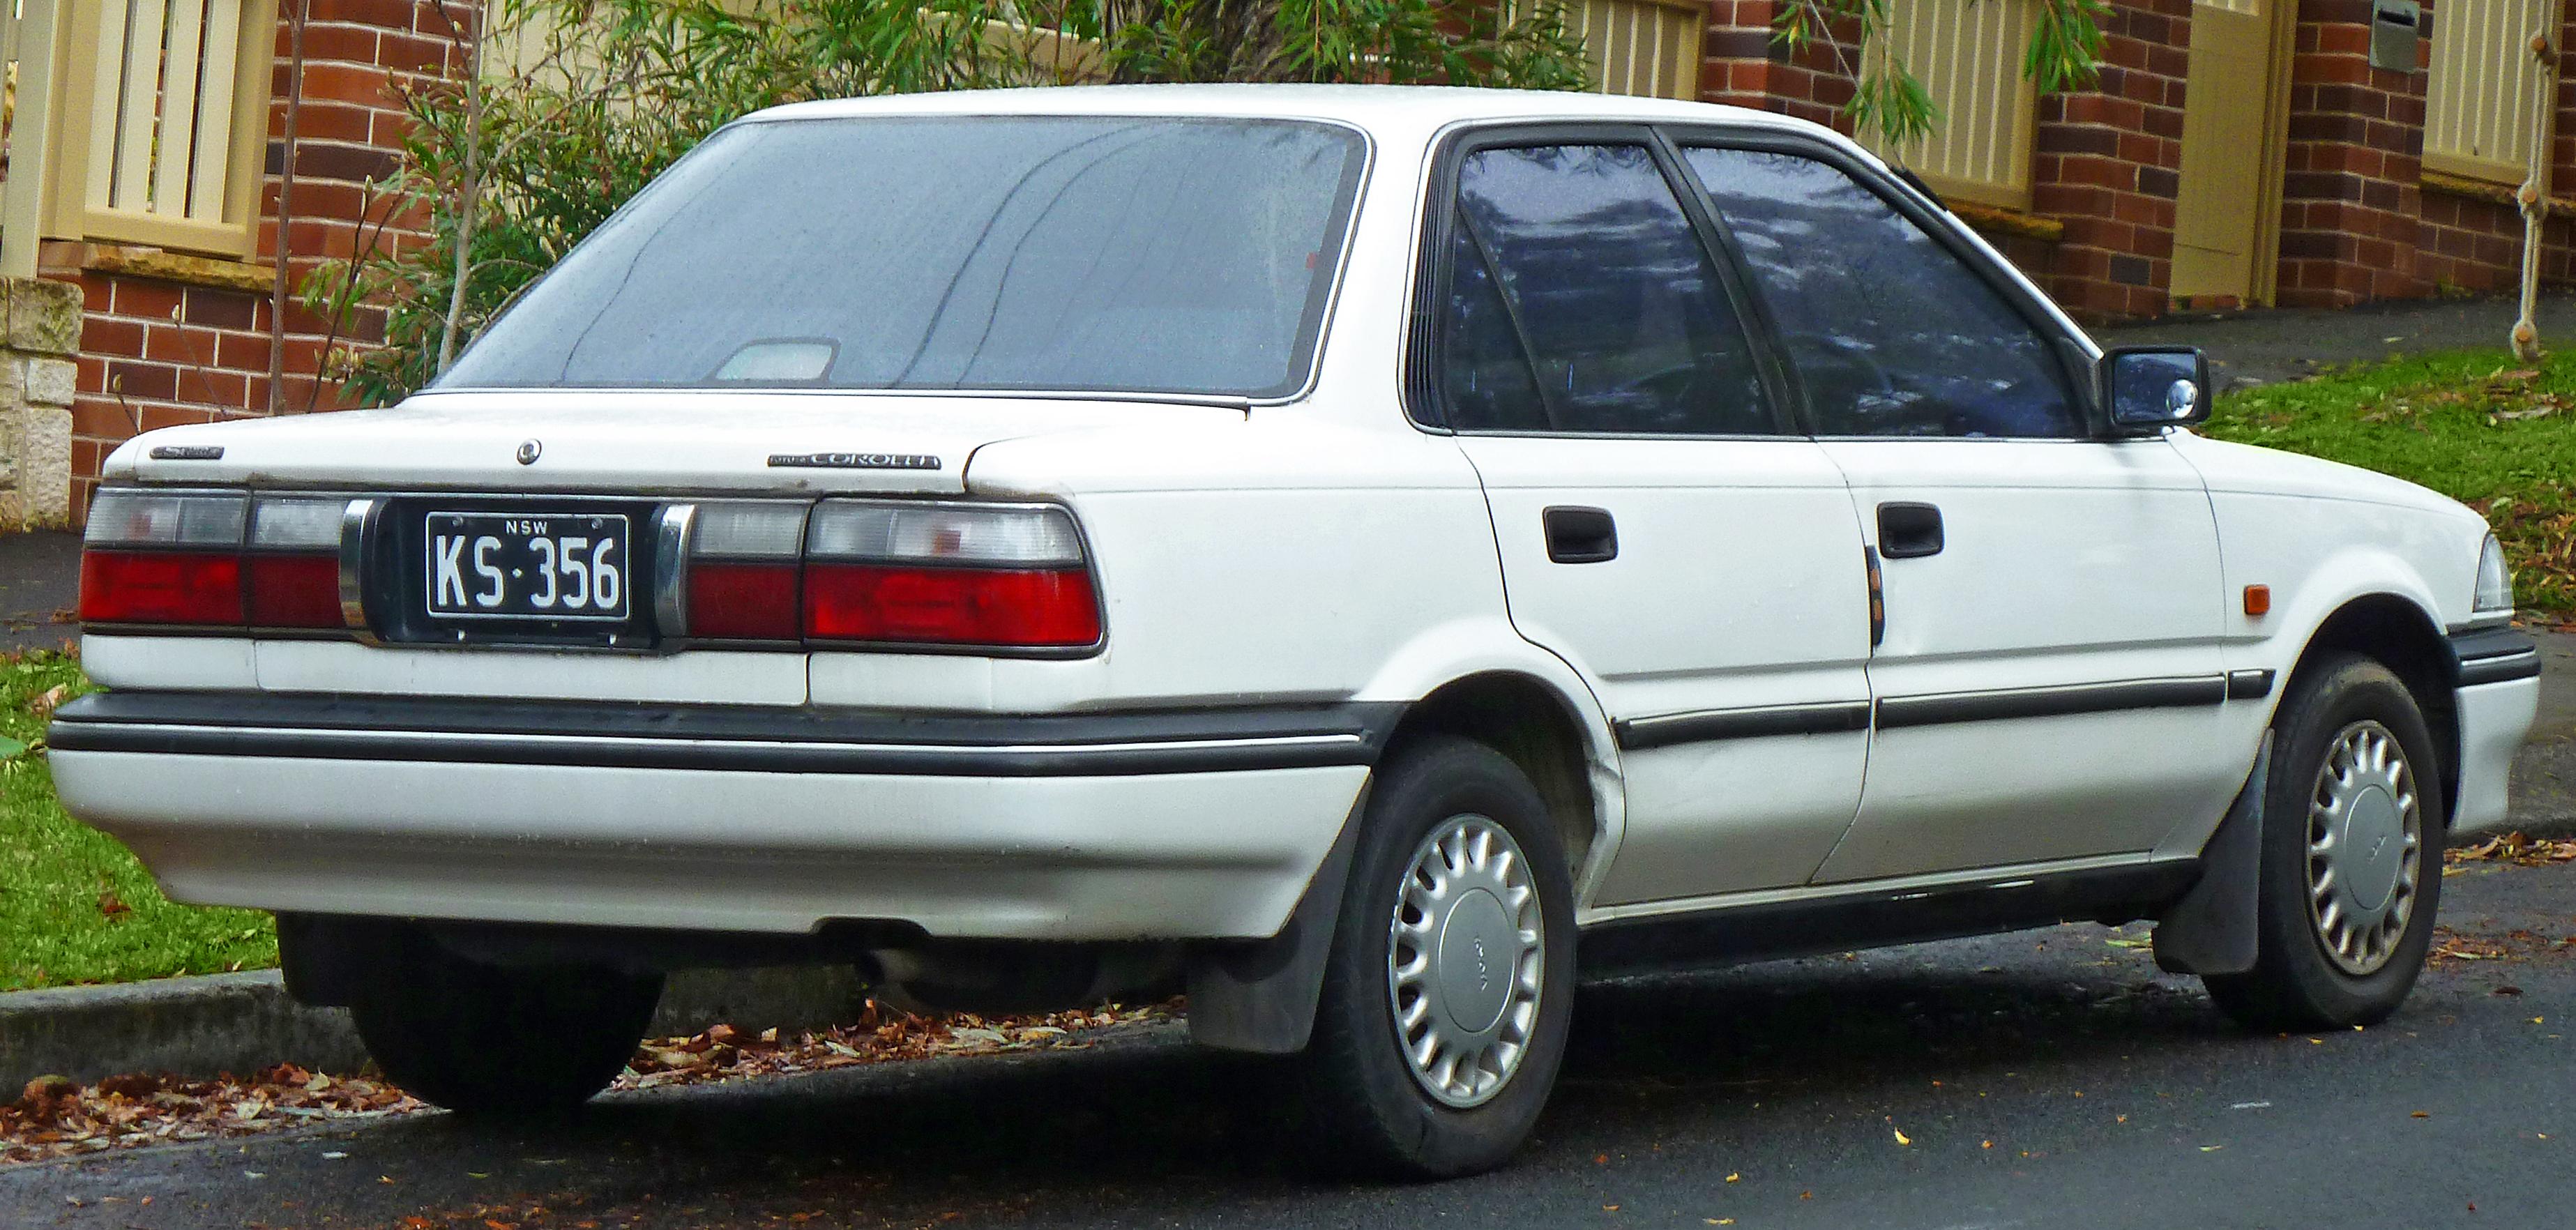 Kelebihan Corolla 1992 Murah Berkualitas